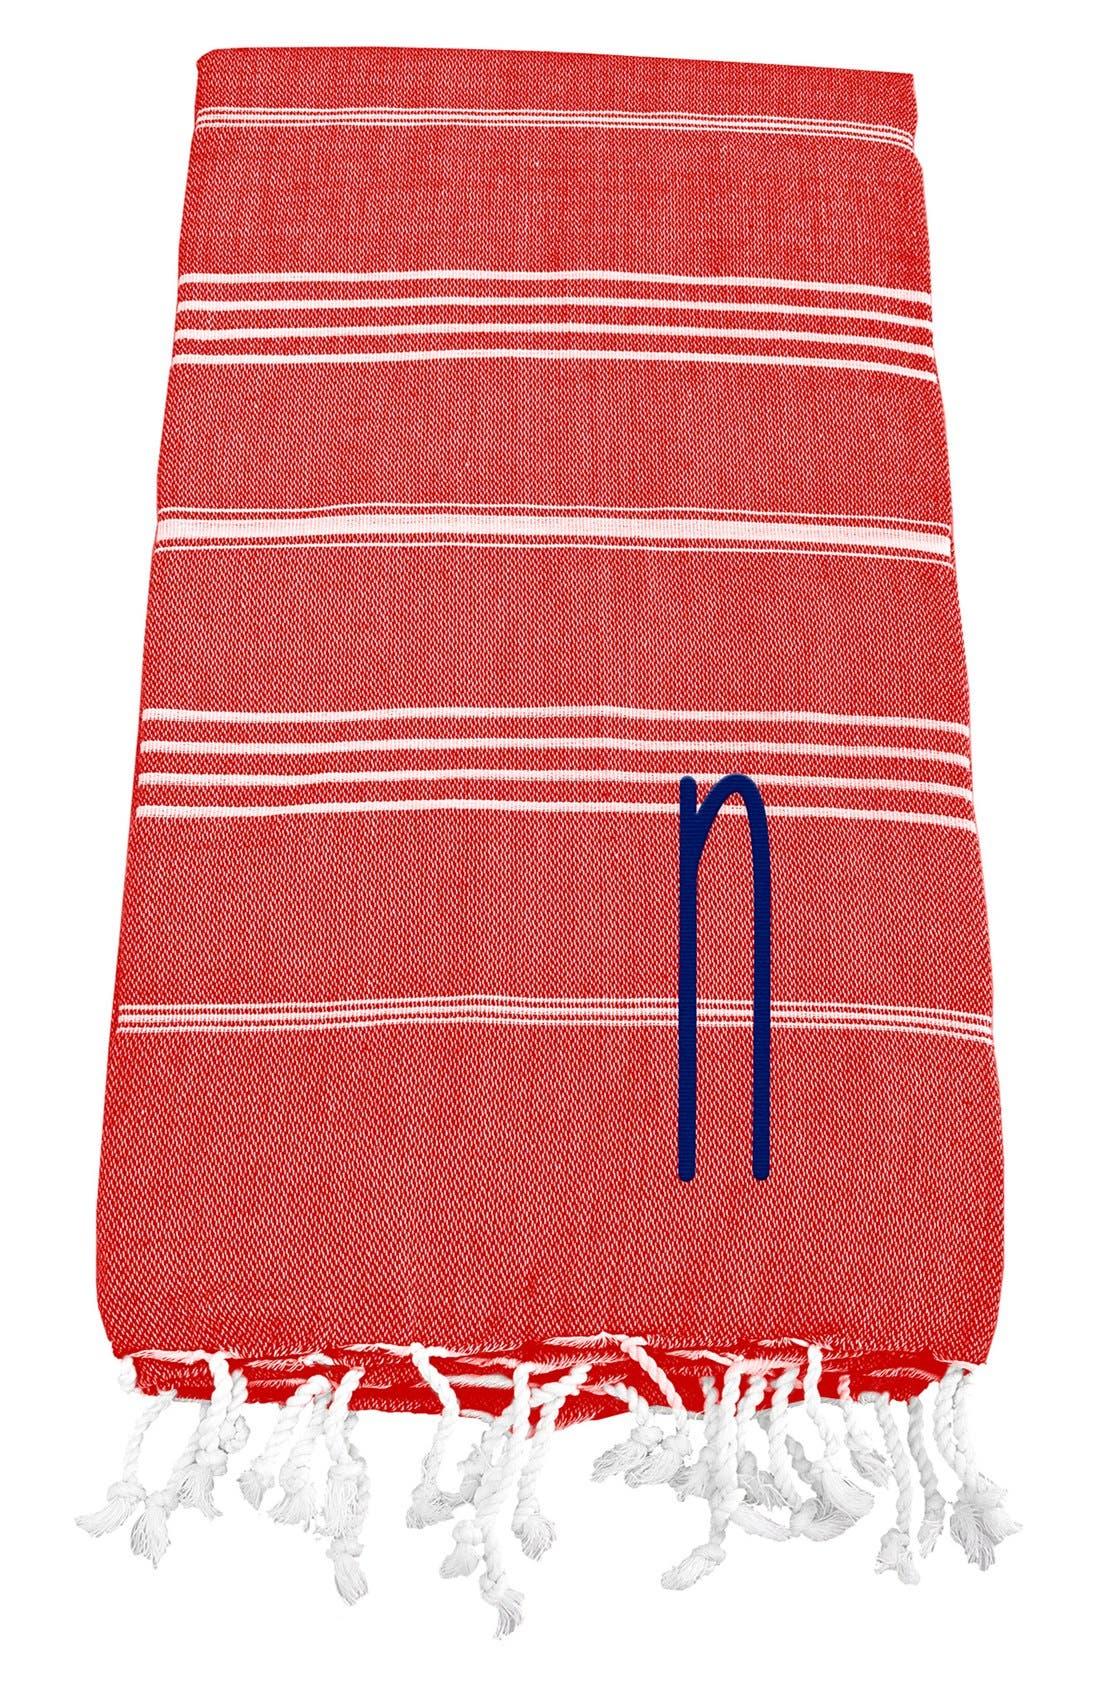 Monogram Turkish Cotton Towel,                             Main thumbnail 123, color,